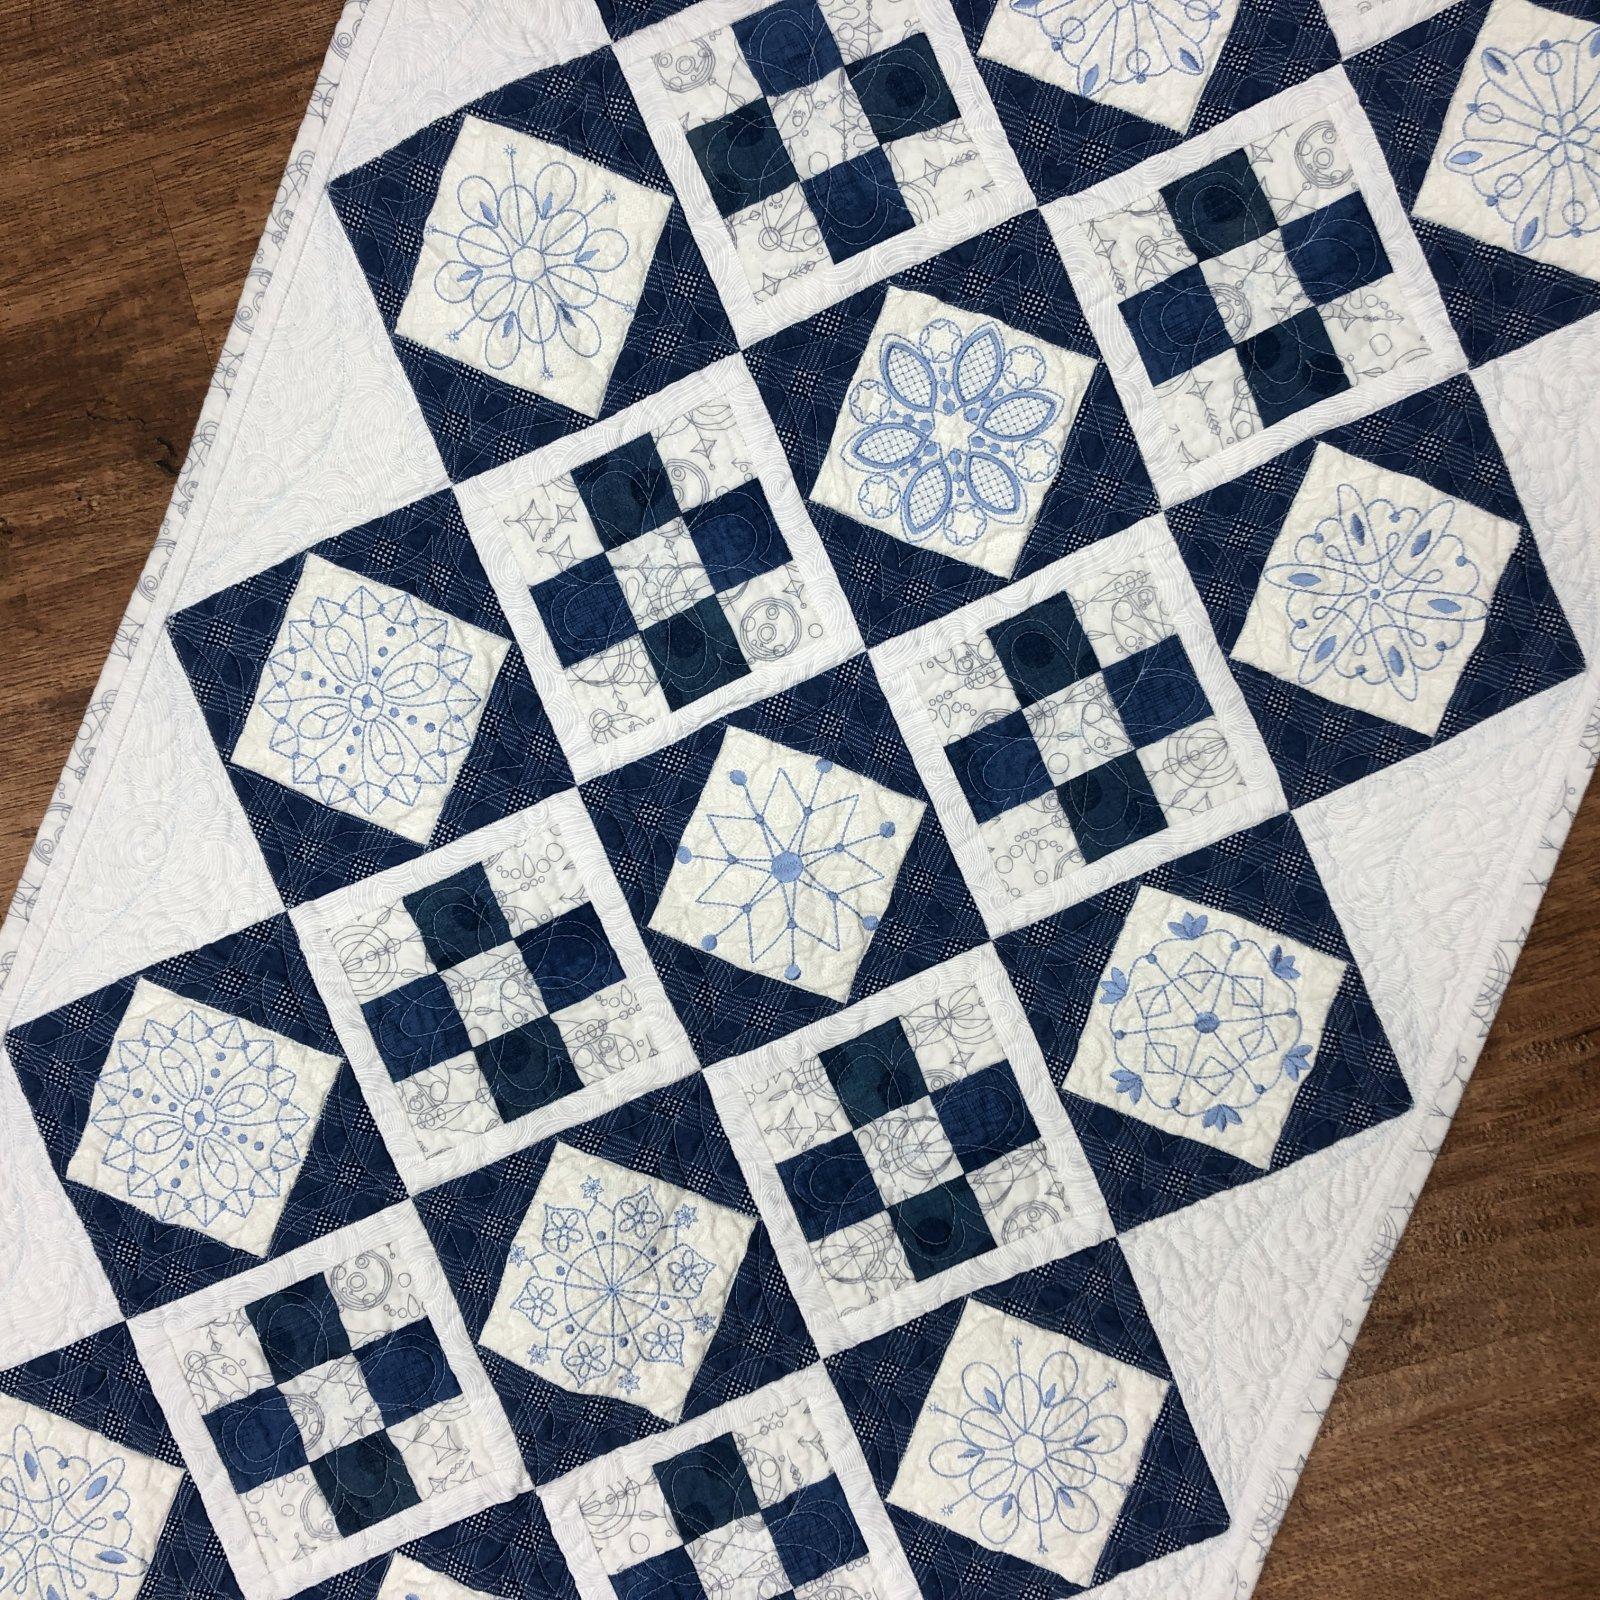 Find the Focus Quilt Pattern